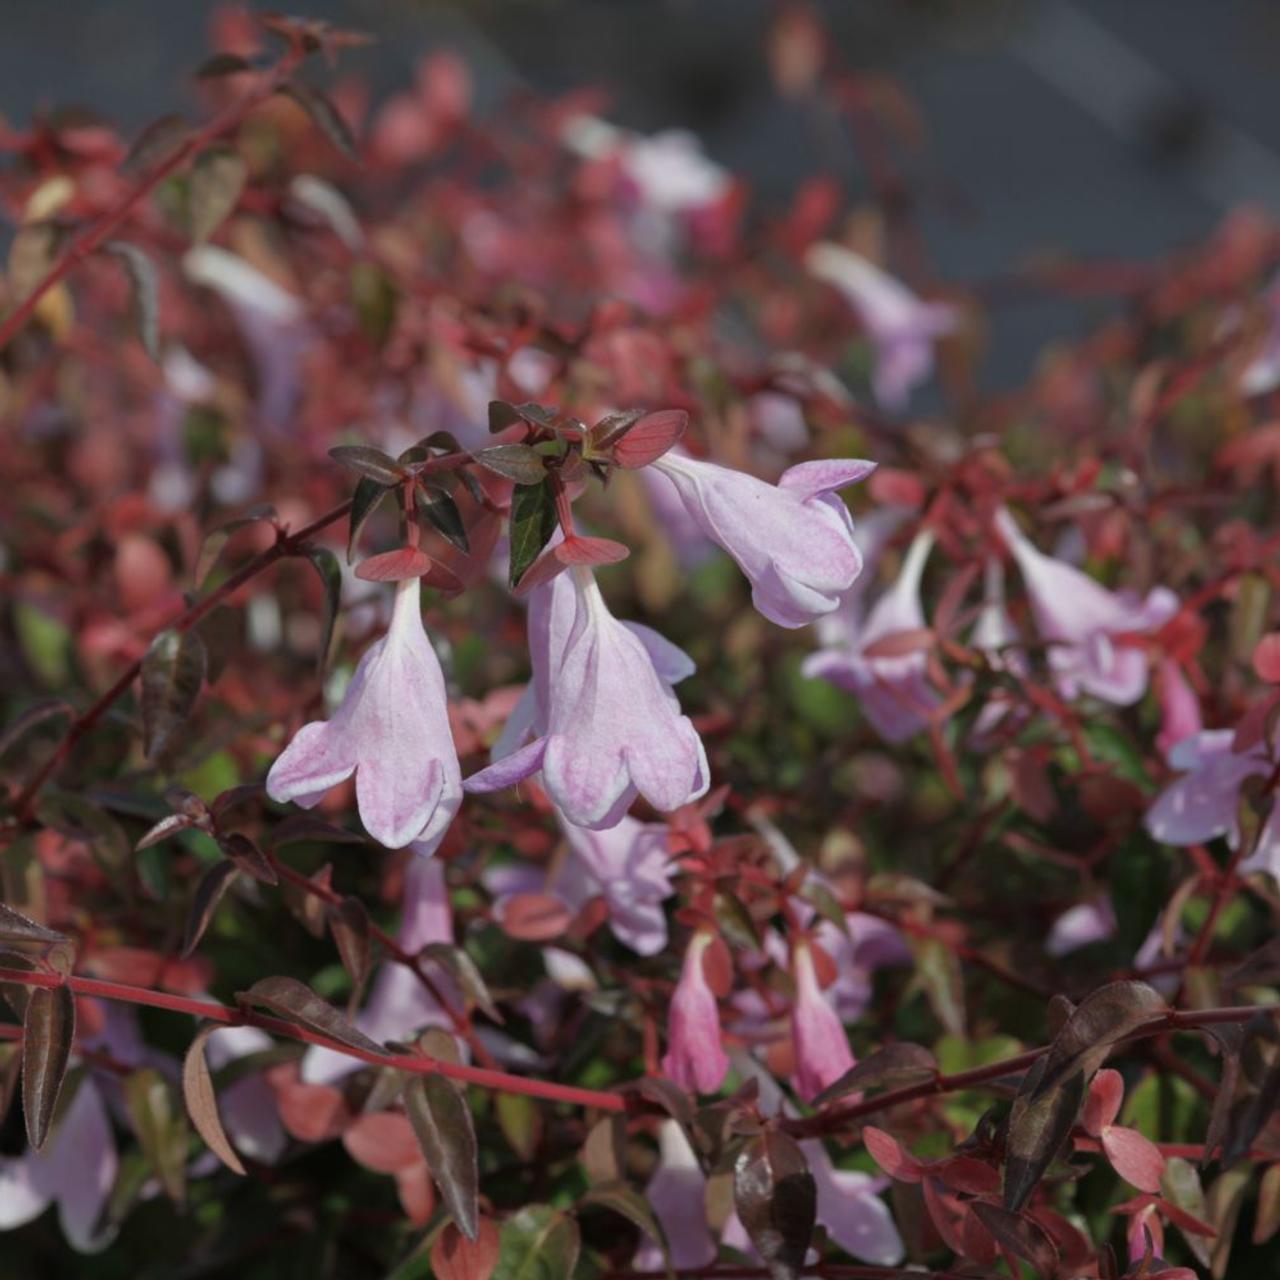 Abelia 'Pinky Bells' plant